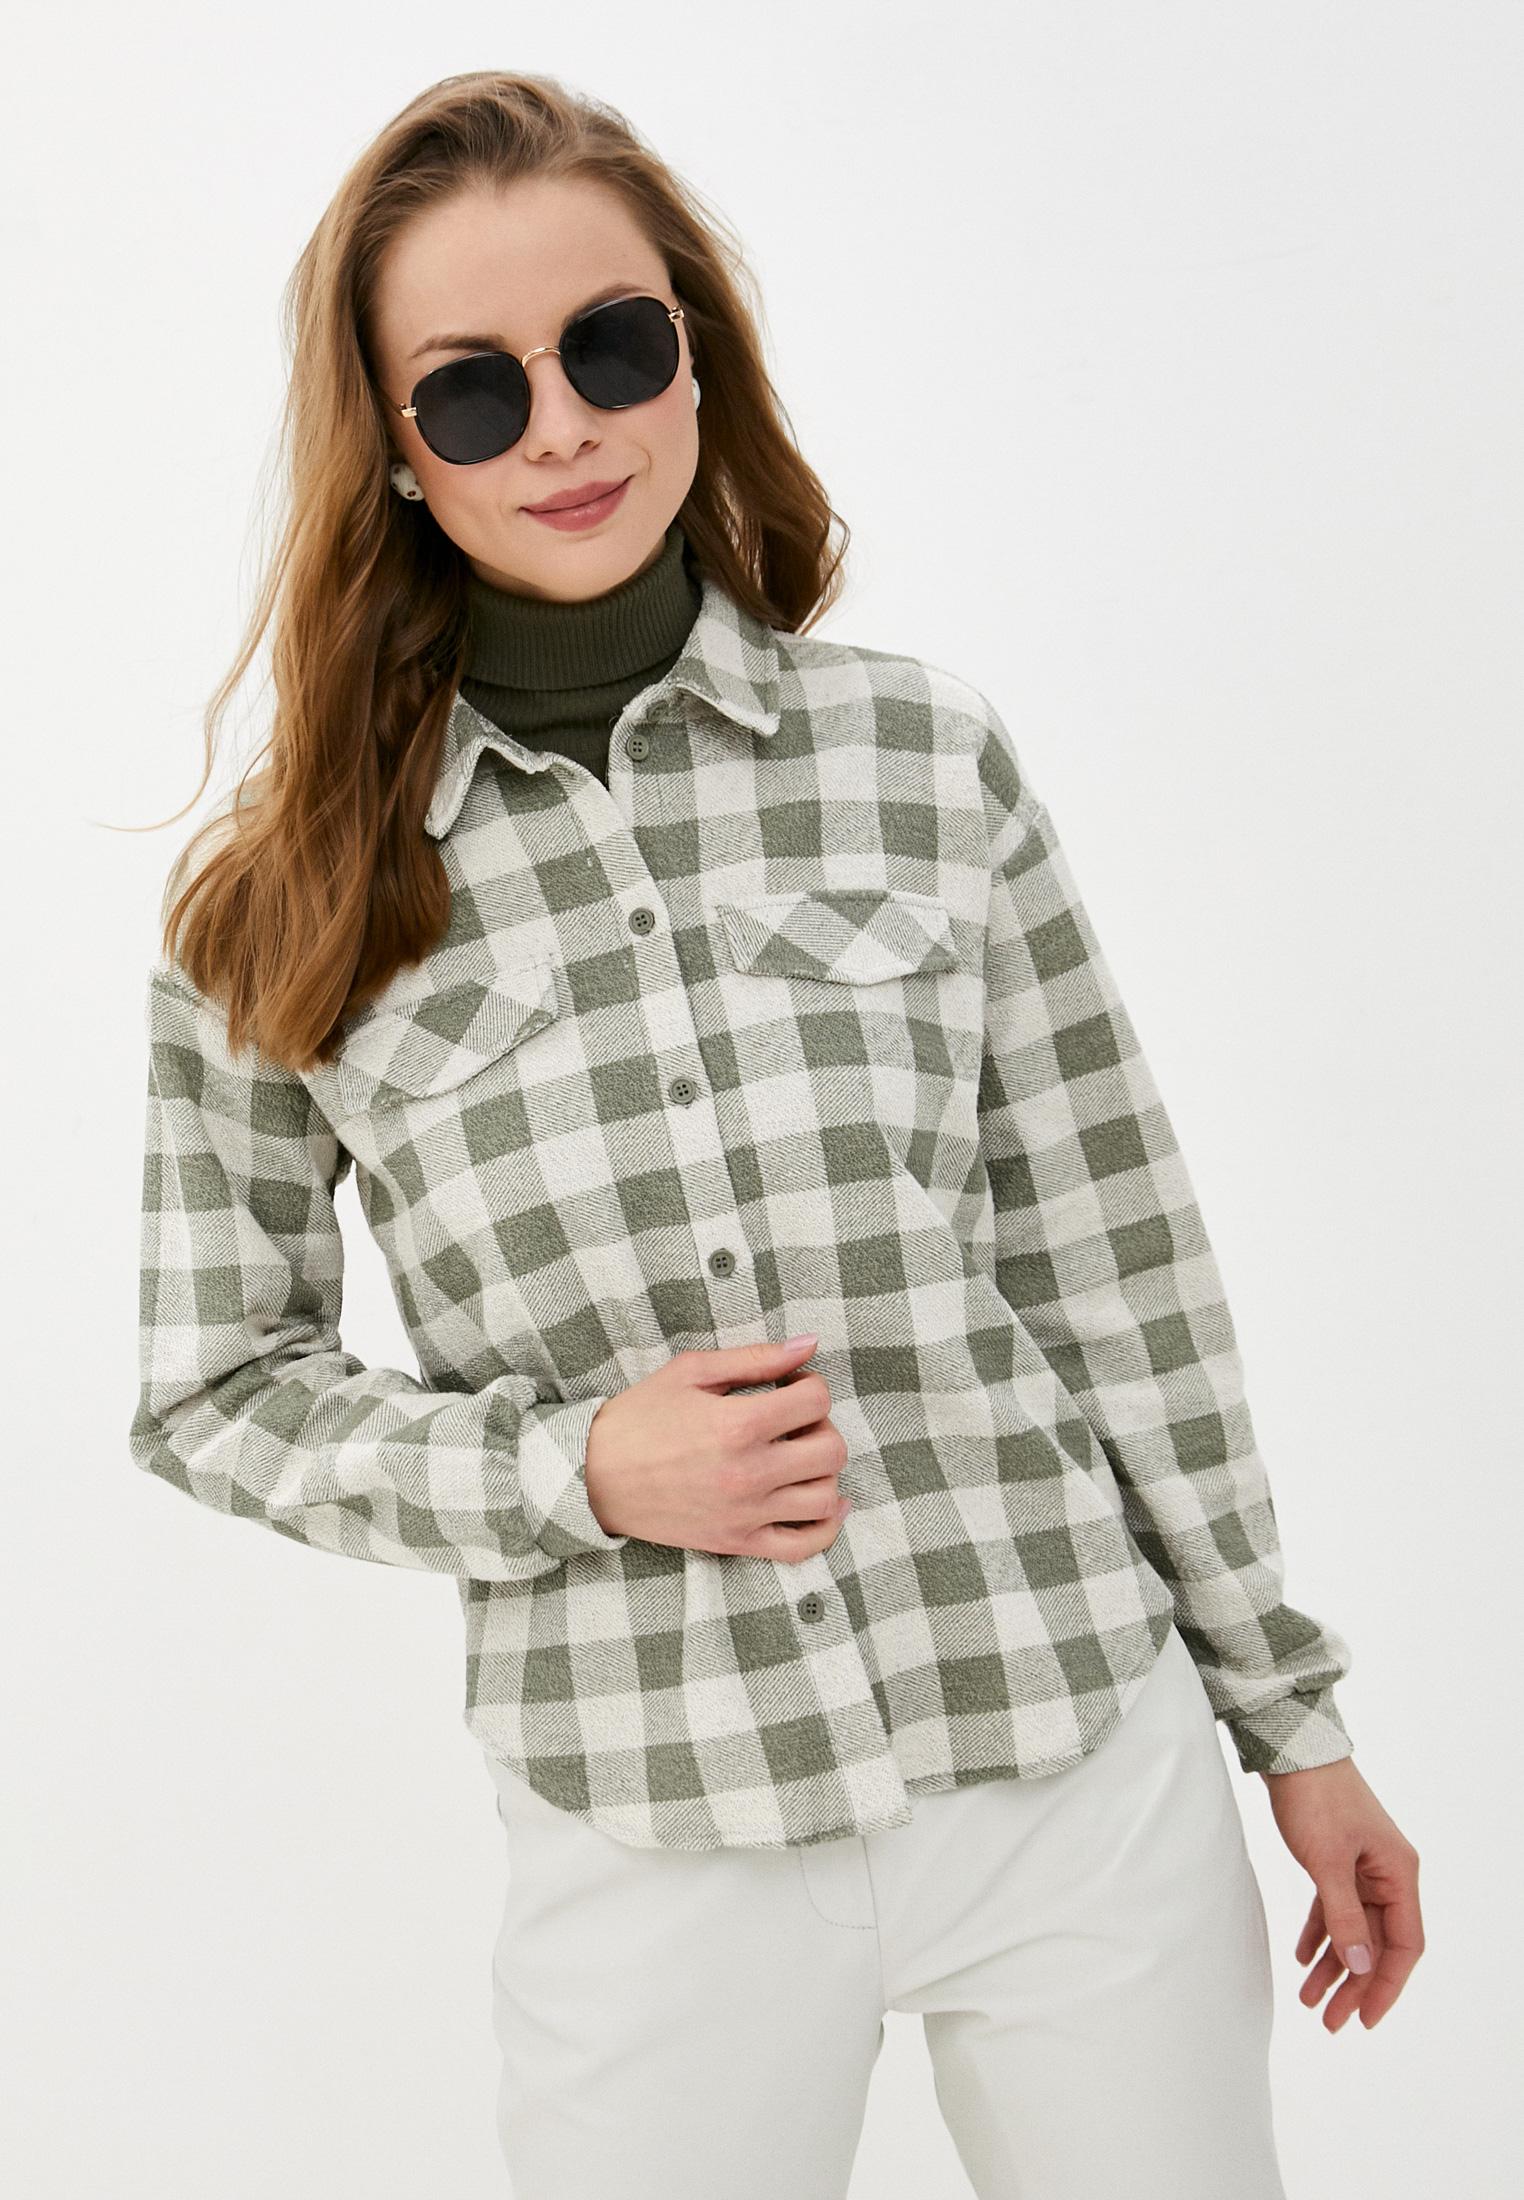 Женские рубашки с длинным рукавом Pieces Рубашка Pieces